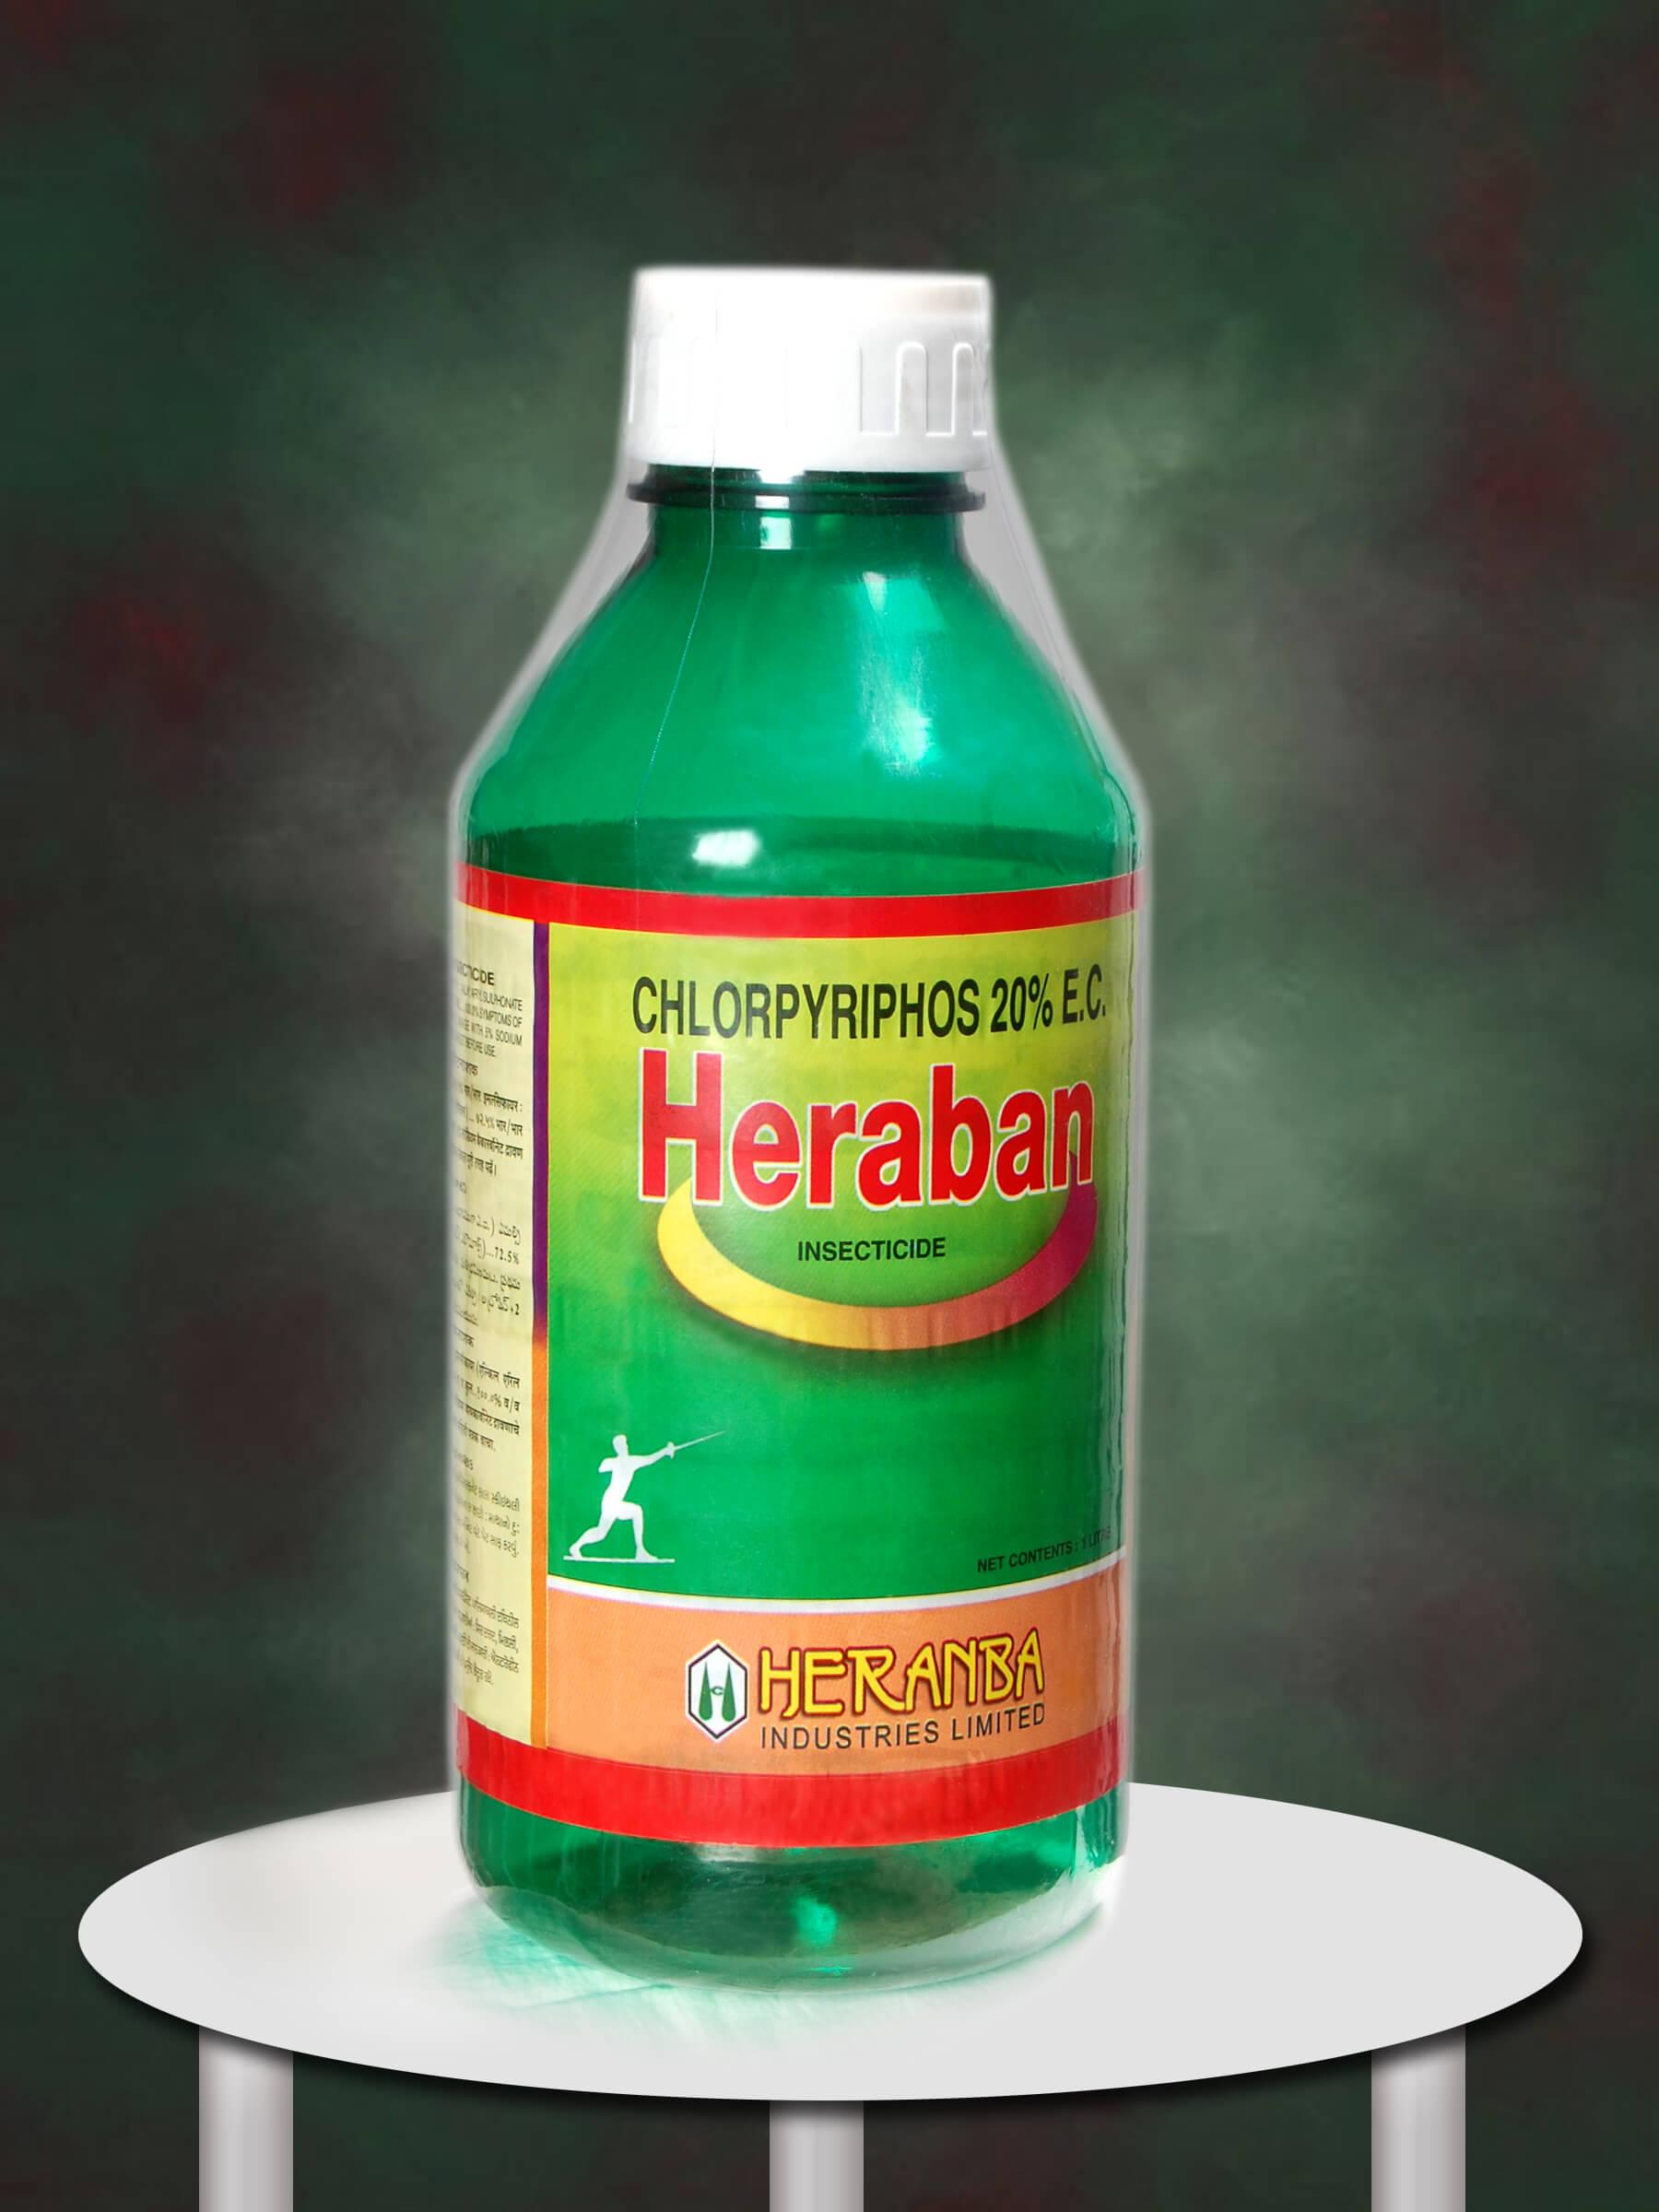 Heraban